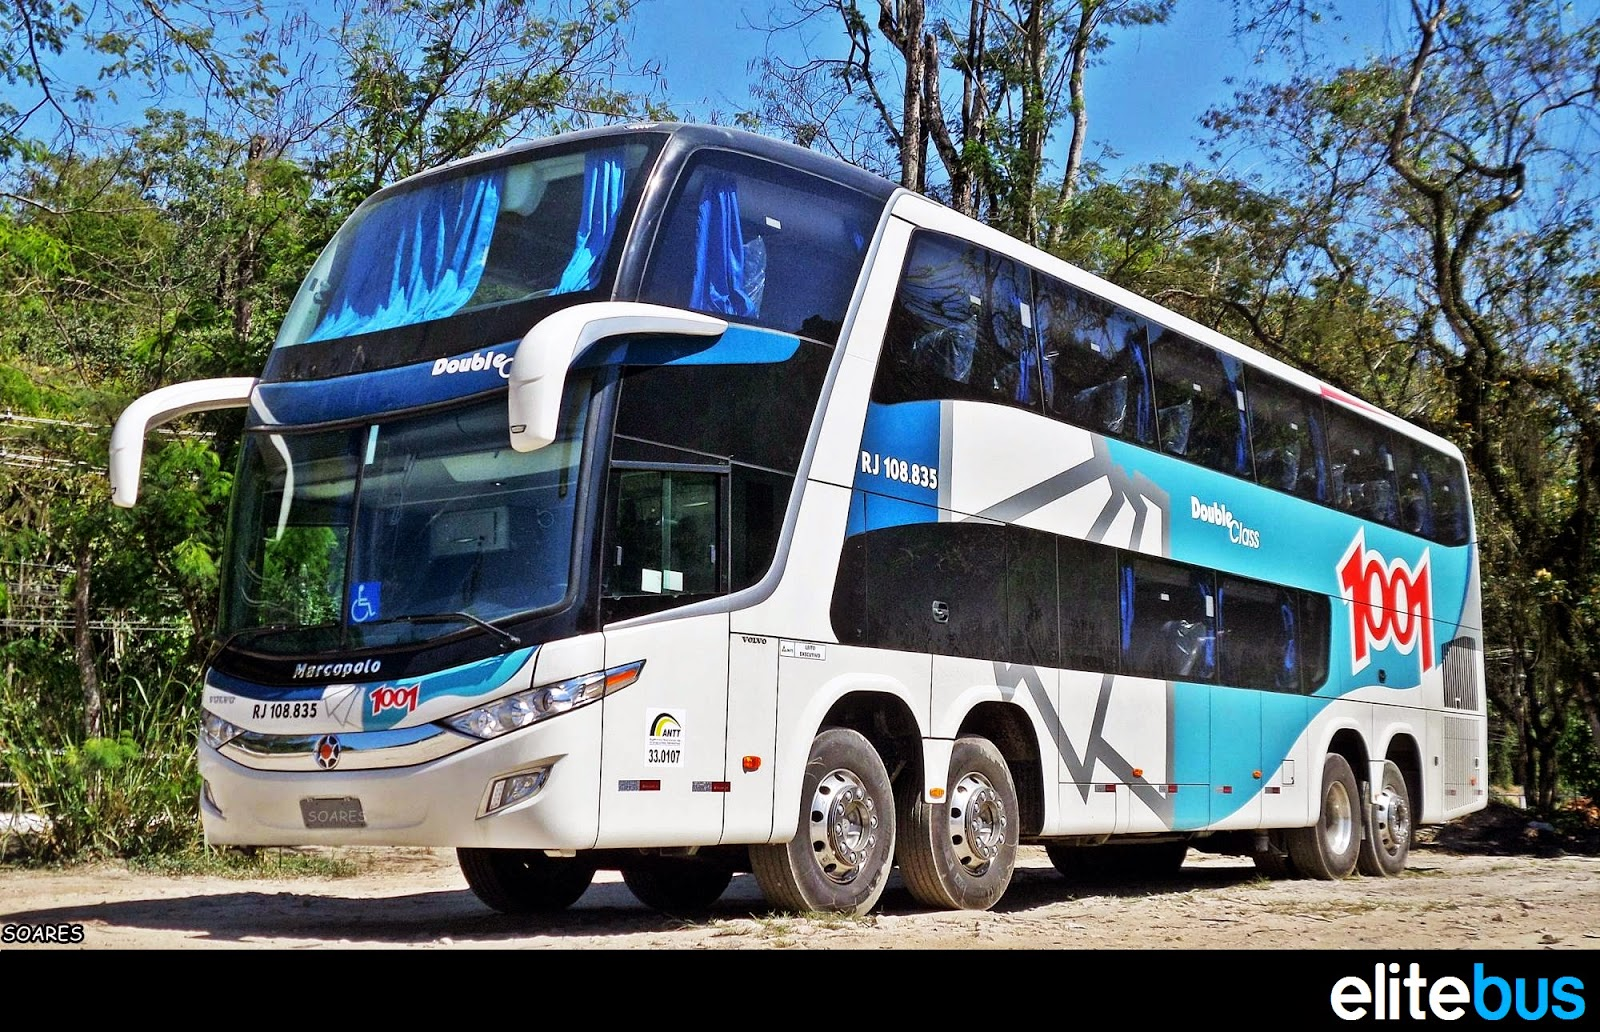 equipe elite bus auto via o 1001 rj. Black Bedroom Furniture Sets. Home Design Ideas